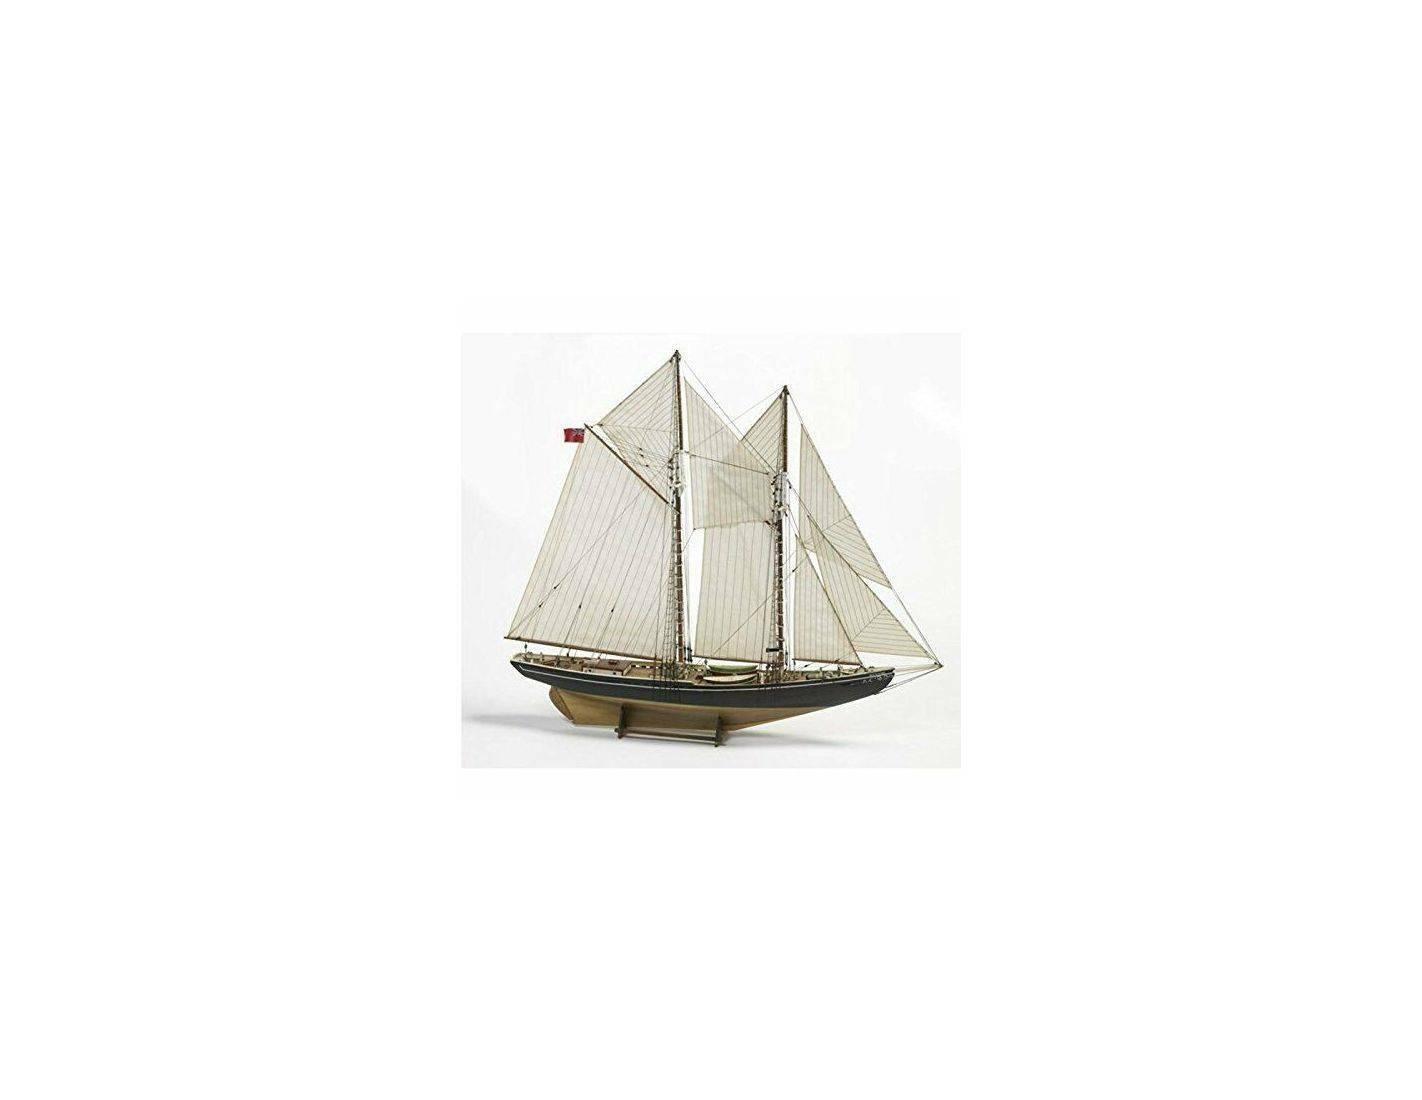 Billing Bpats Bluenose 576 1:65 Kit nave Modellino